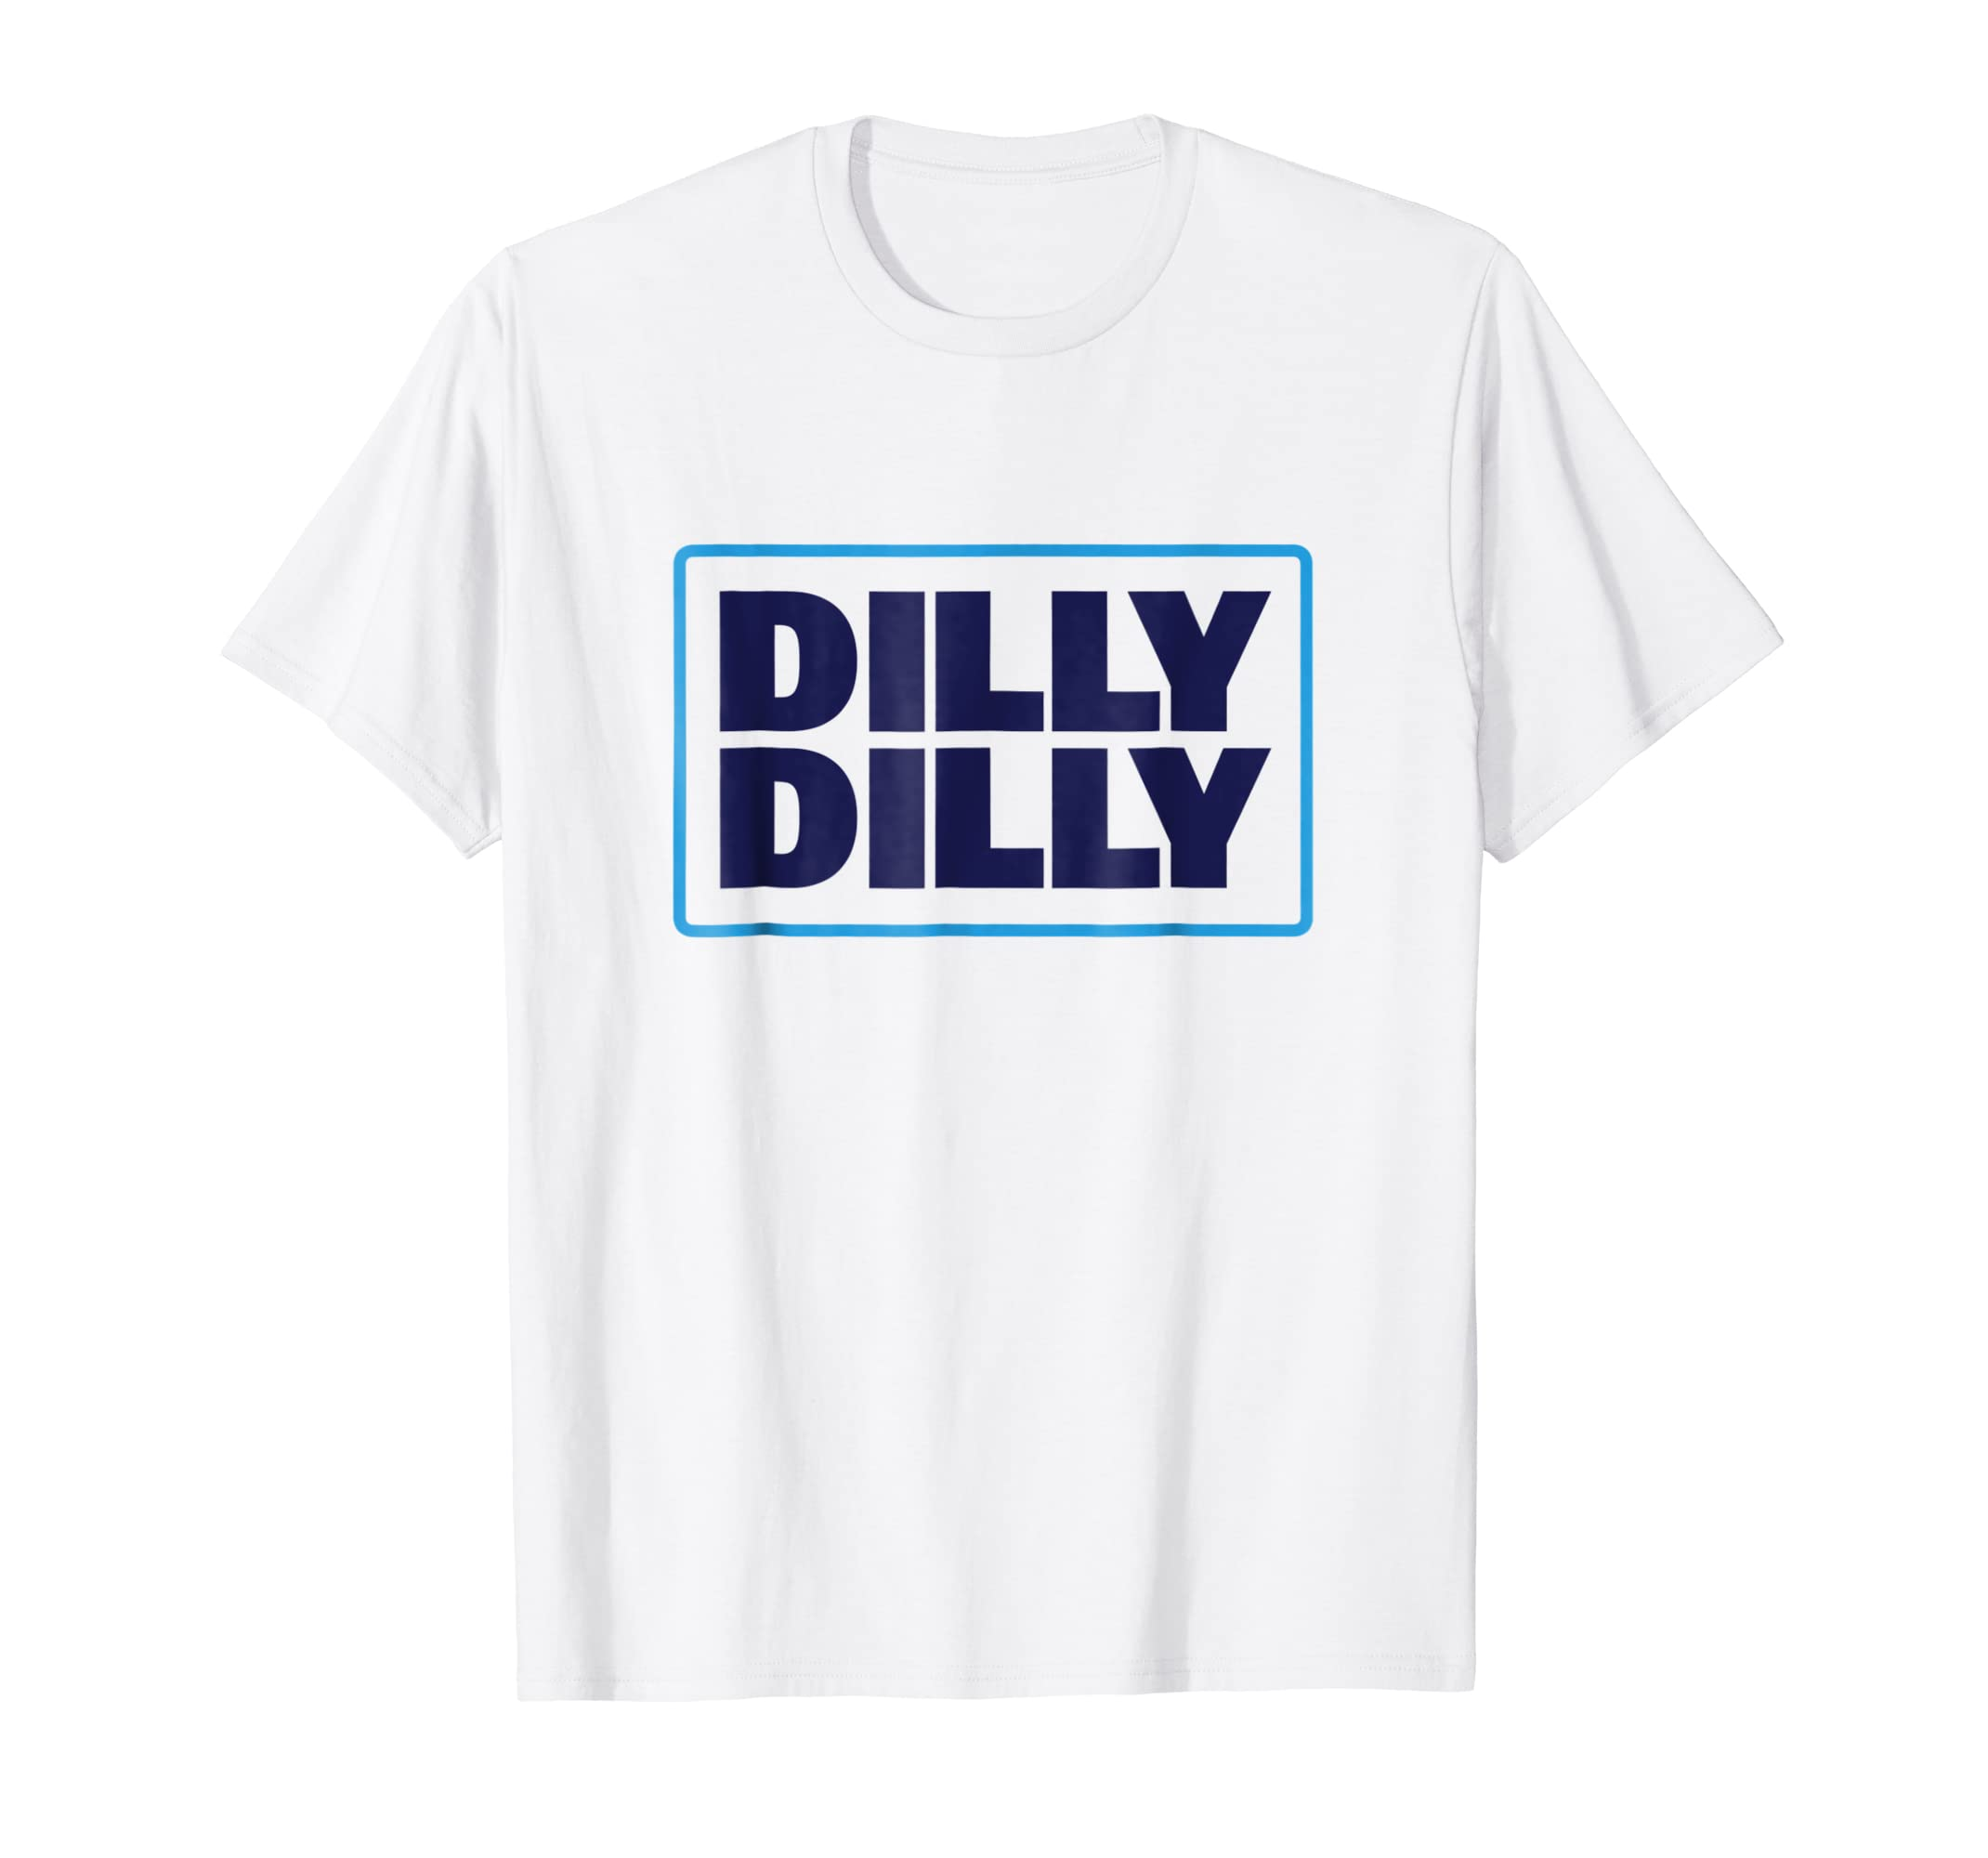 22f2f93d Official Dilly Dilly T Shirt-azvn – Anzvntee